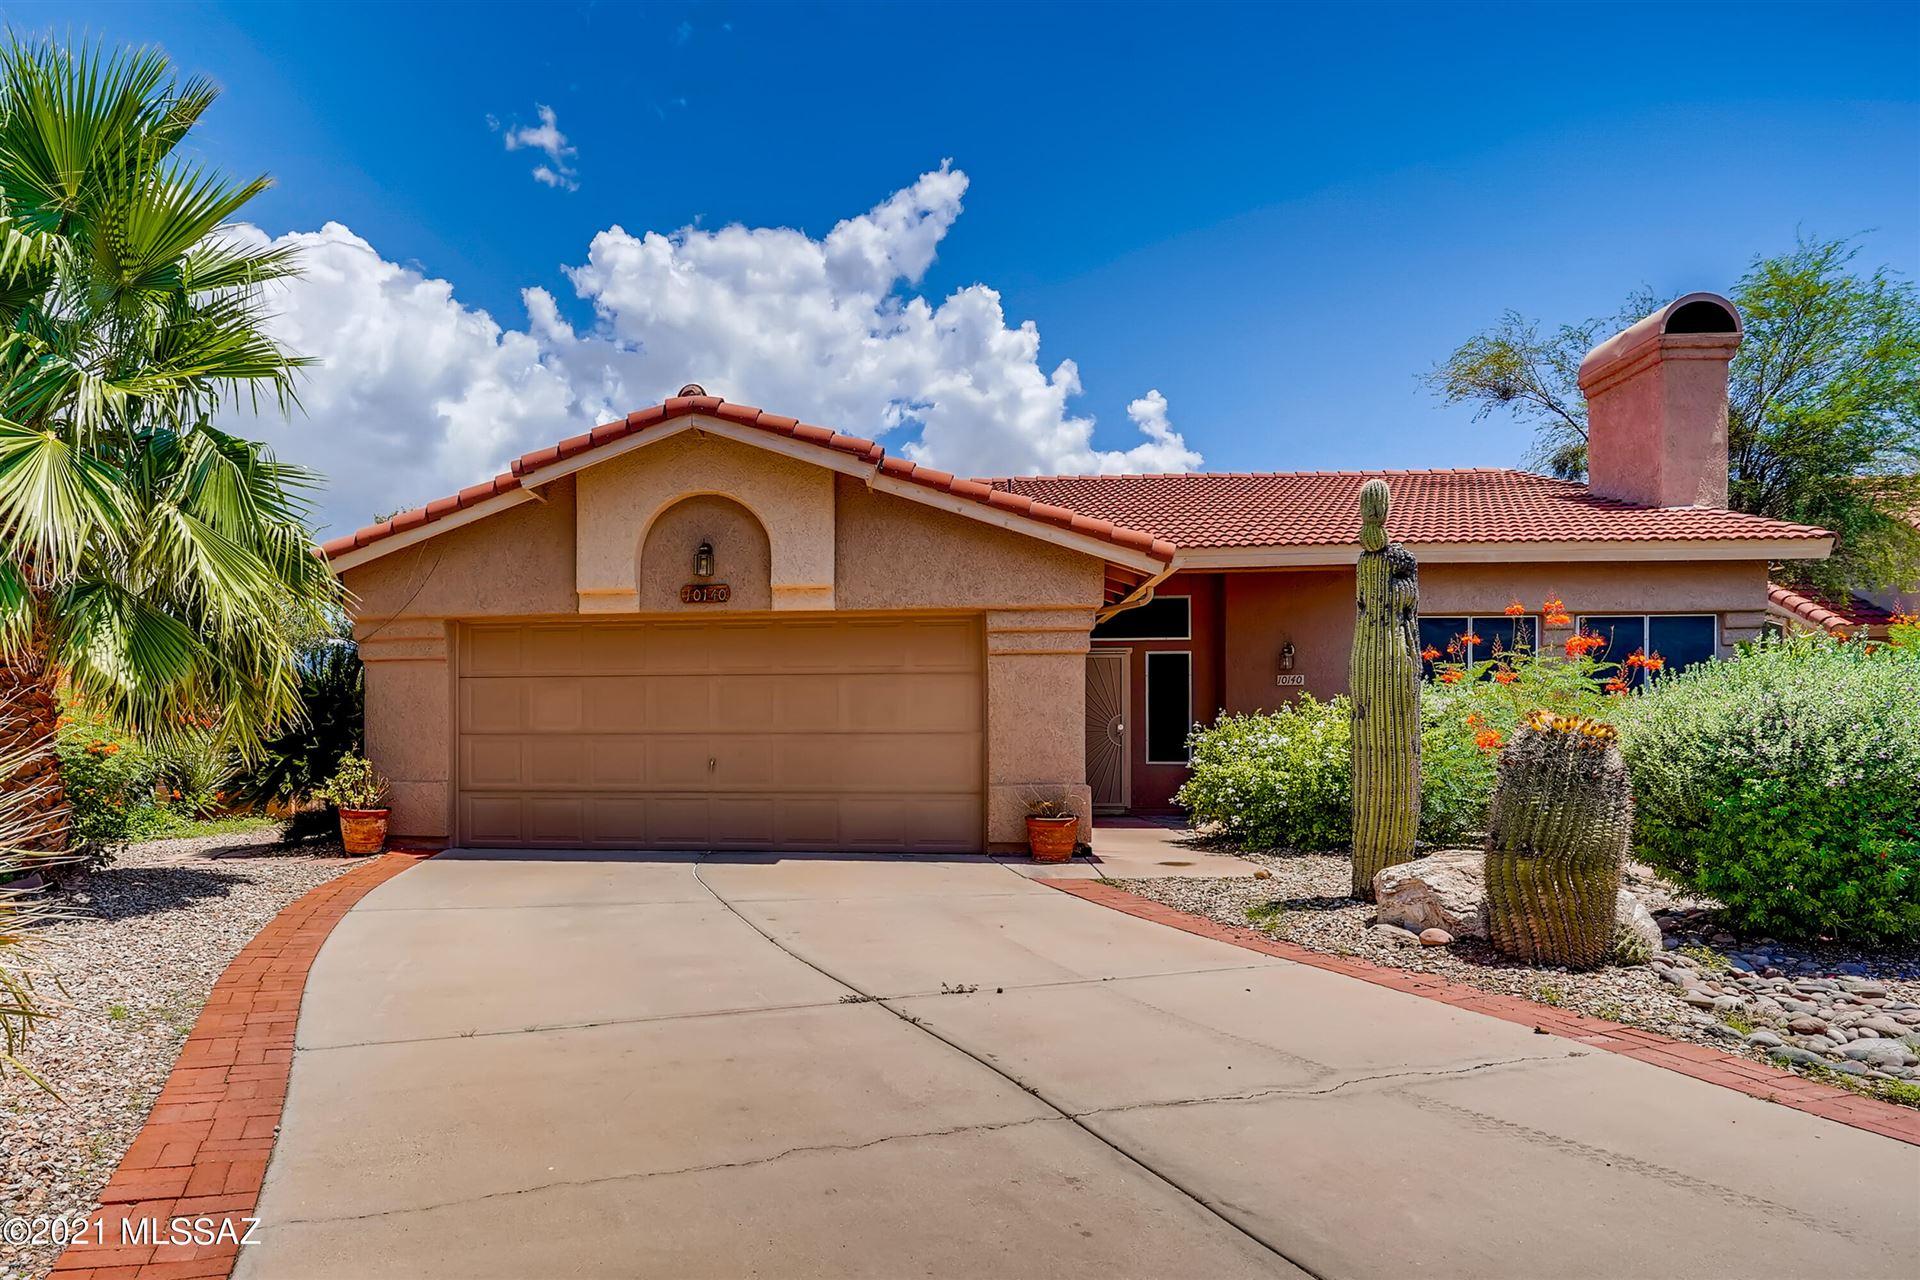 10140 N Inverrary Place, Tucson, AZ 85737 - MLS#: 22119185